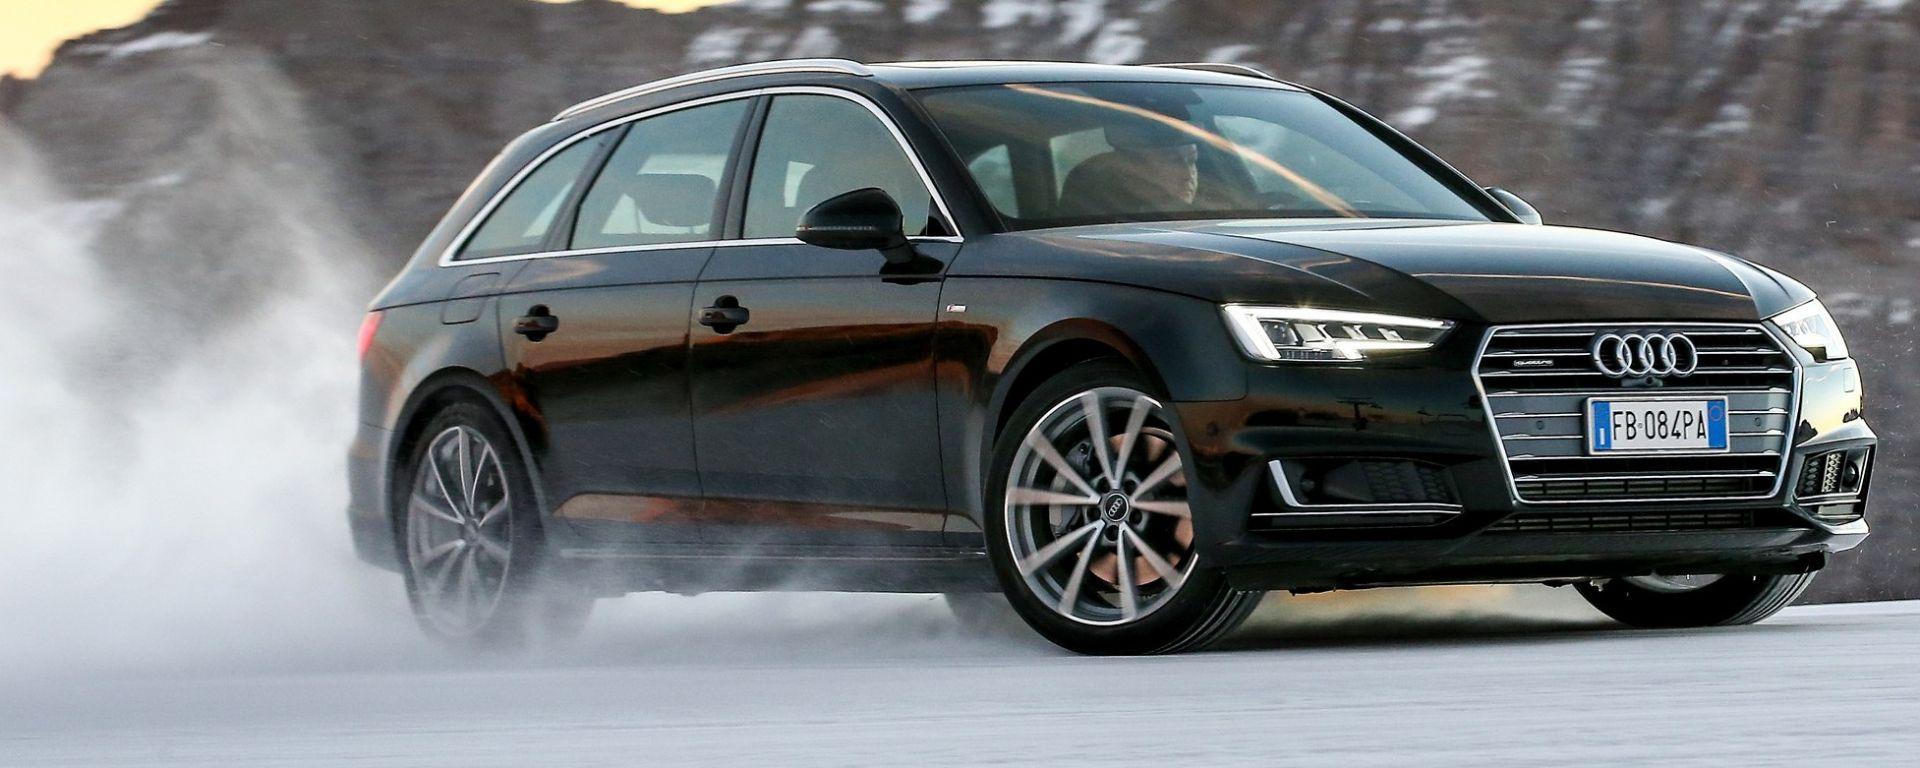 Audi a4 avant 2 0 tdi 190 cv s tronic quattro